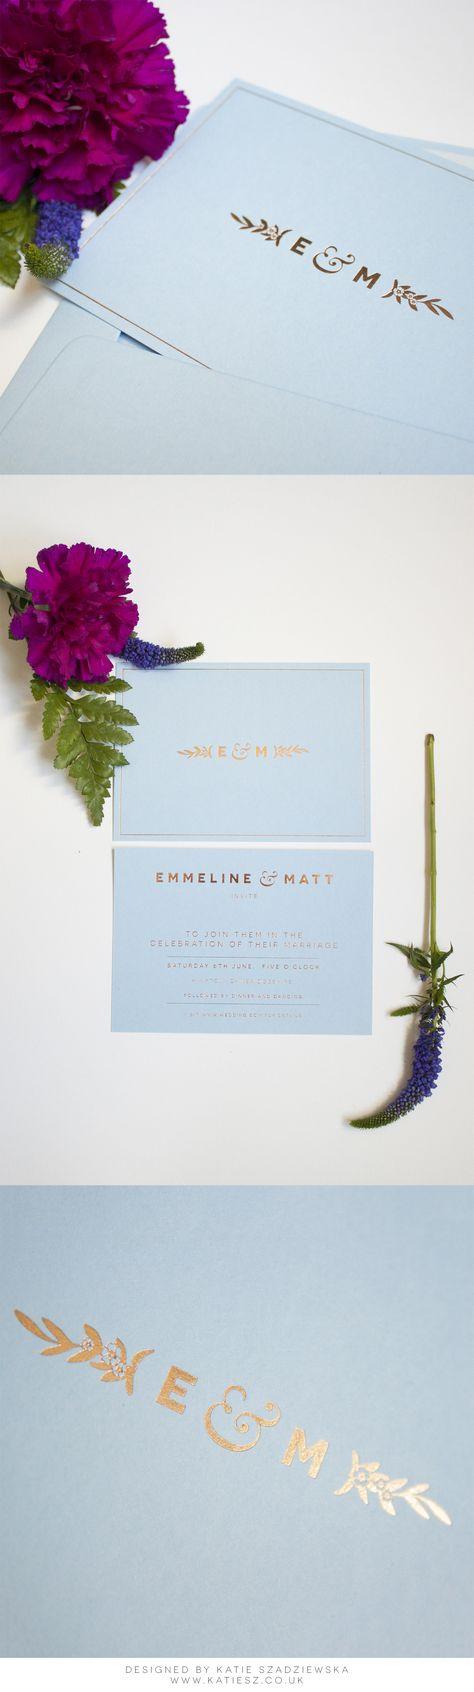 Elegant, Minimal & Modern Forget-Me-Not Floral Wedding Invitation. Colorplan Azure Blue with Rose Gold foil by www.paperbowlondon.com